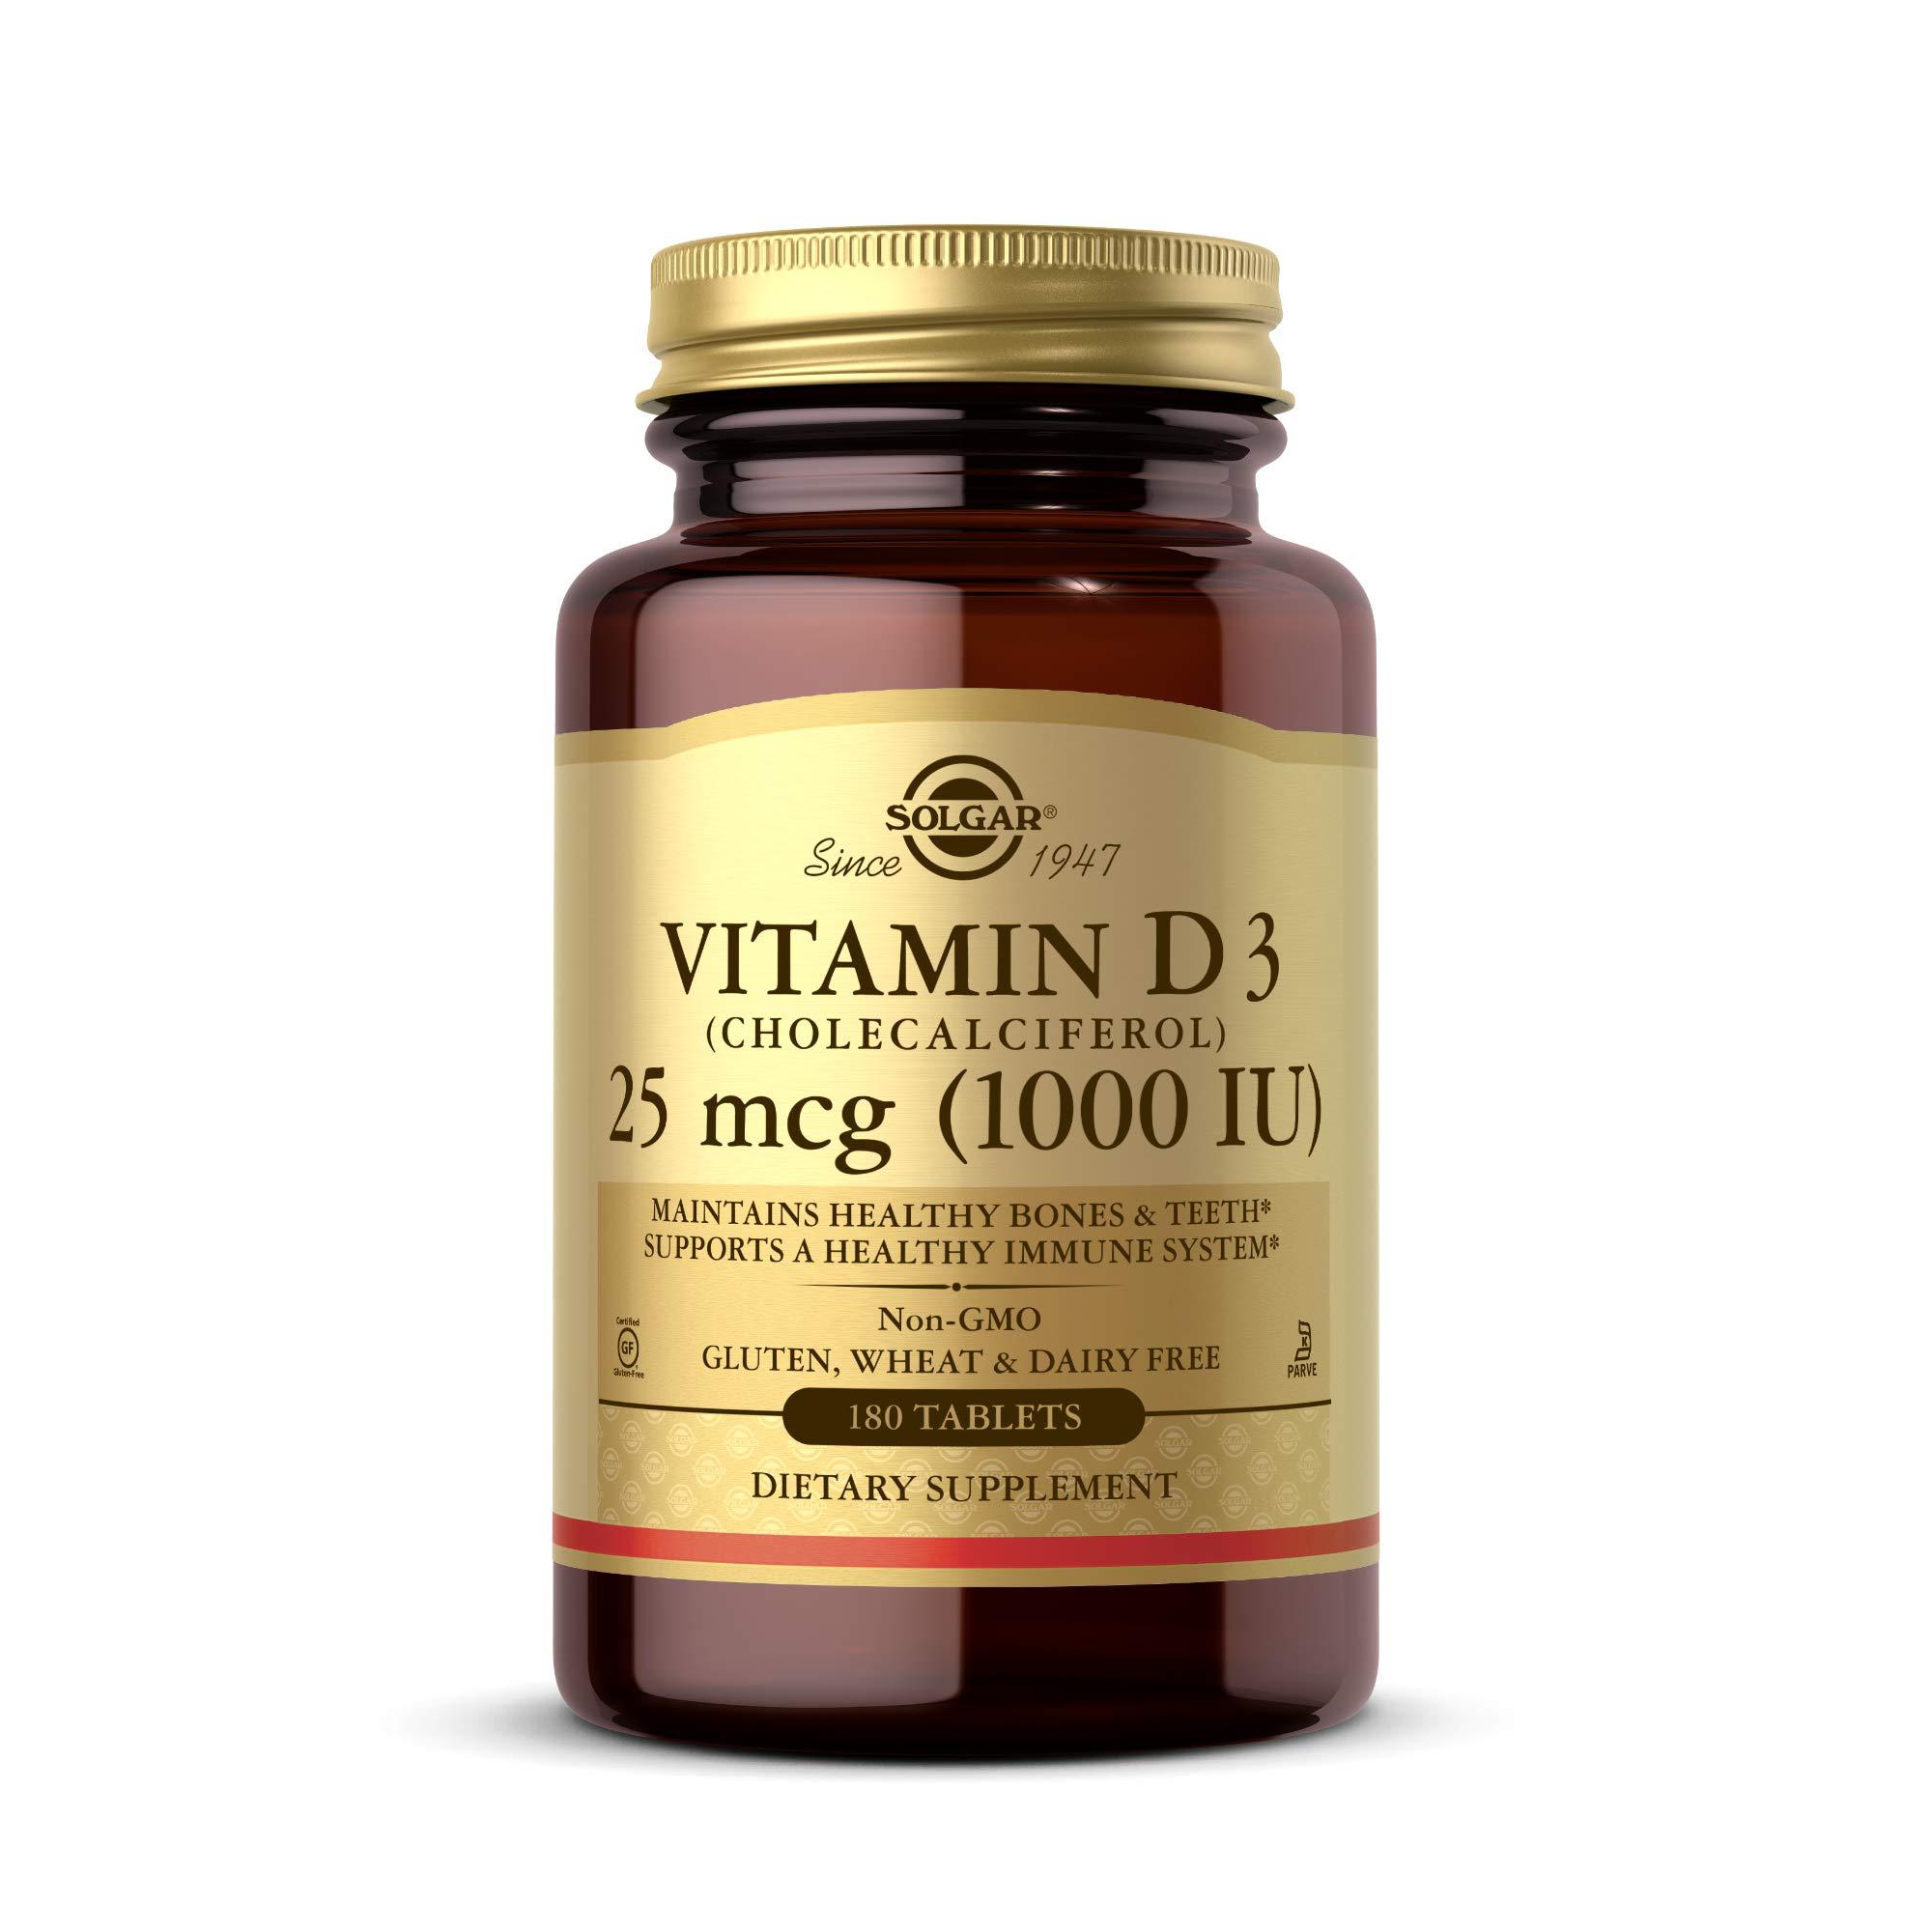 Solgar Vitamin D3 (Cholecalciferol) 25 mcg (1000 IU), 180 Tablets - Helps Maintain Healthy Bones & Teeth - Immune System Support - Non-GMO, Gluten Free, Dairy Free, Kosher - 180 Servings